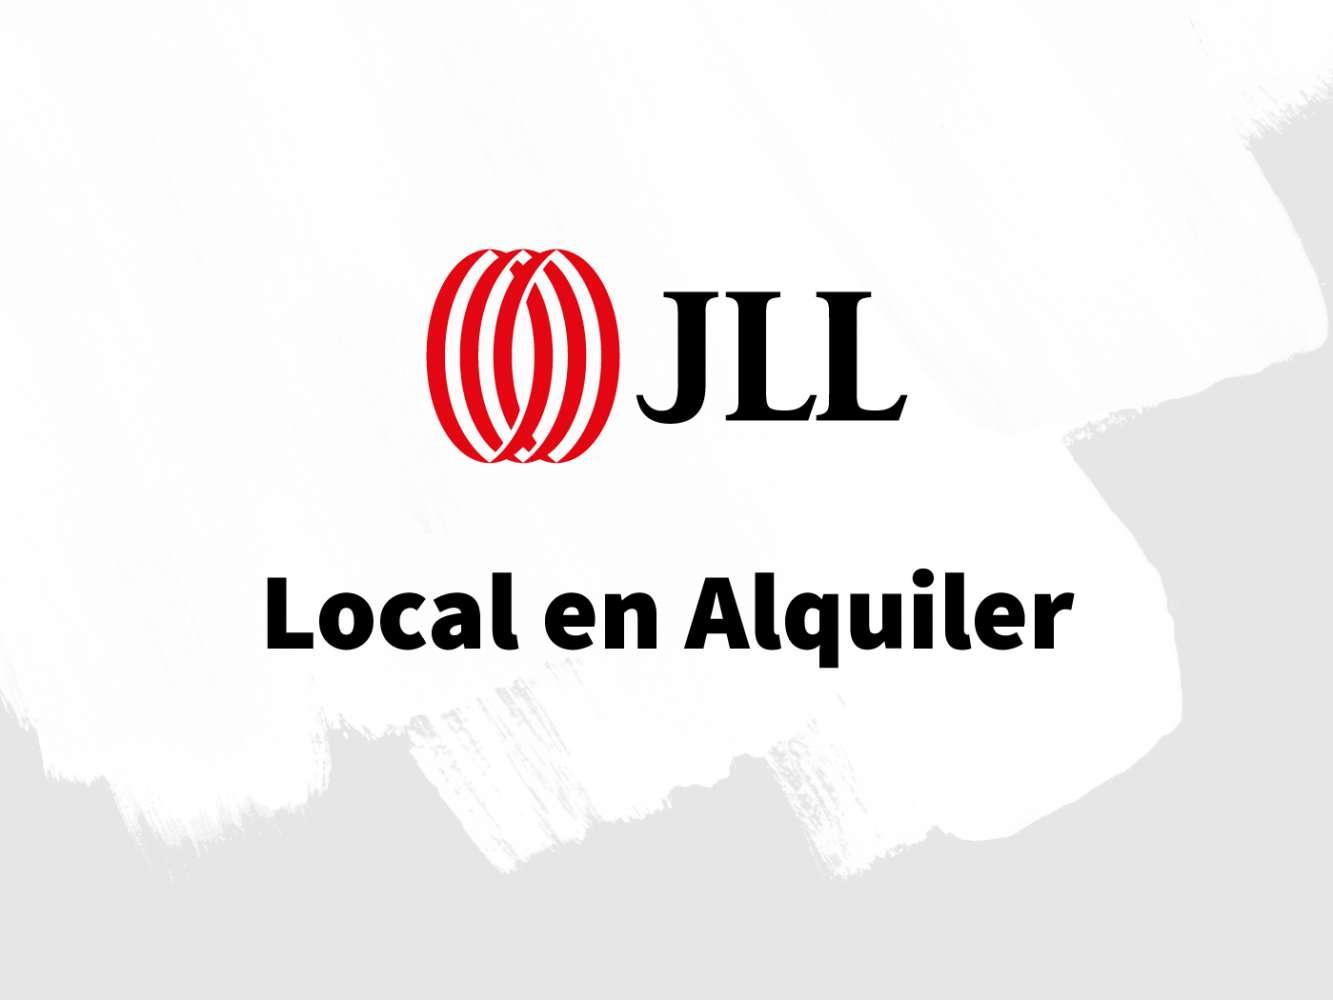 Local comercial Torre-pacheco, 30700 - Local en Torre-Pacheco